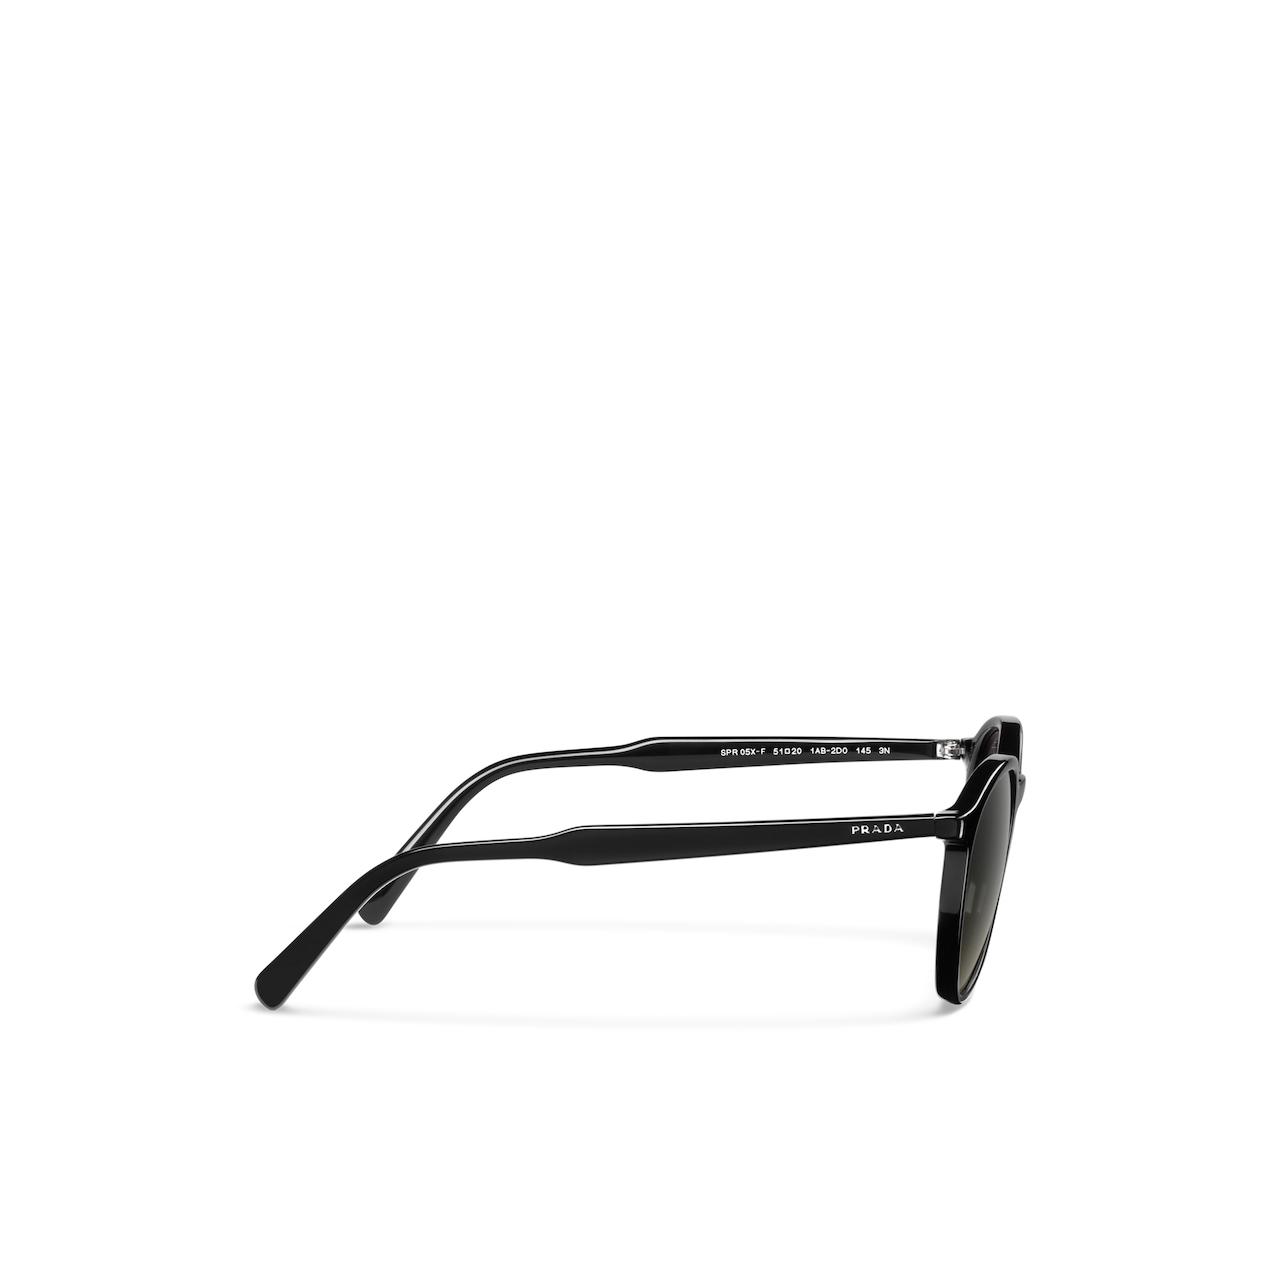 Prada Prada Eyewear Collection sunglasses - Alternative fit 4